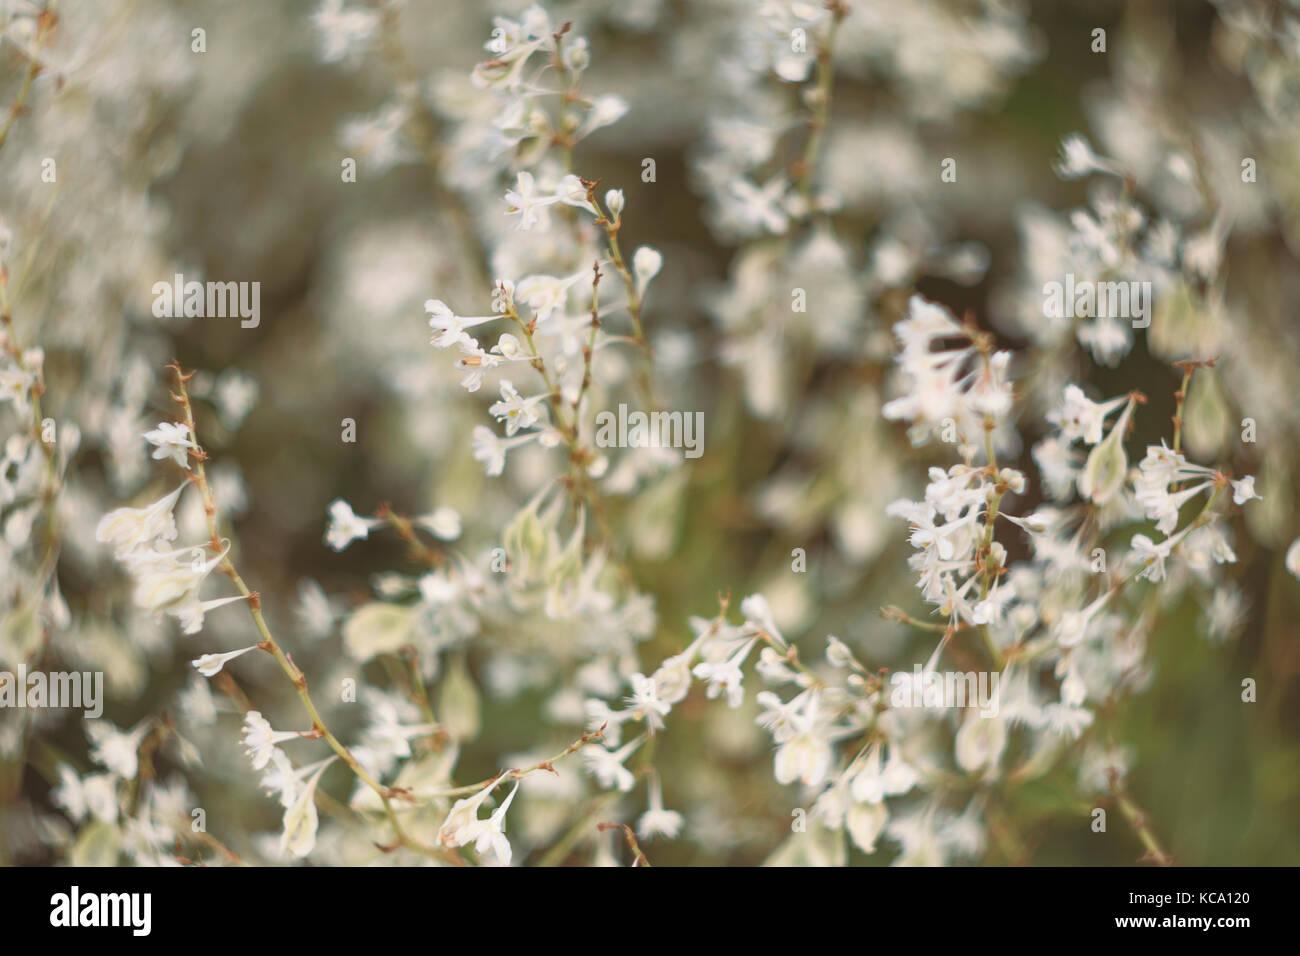 Fallopia, white dreamy flowers - Stock Image